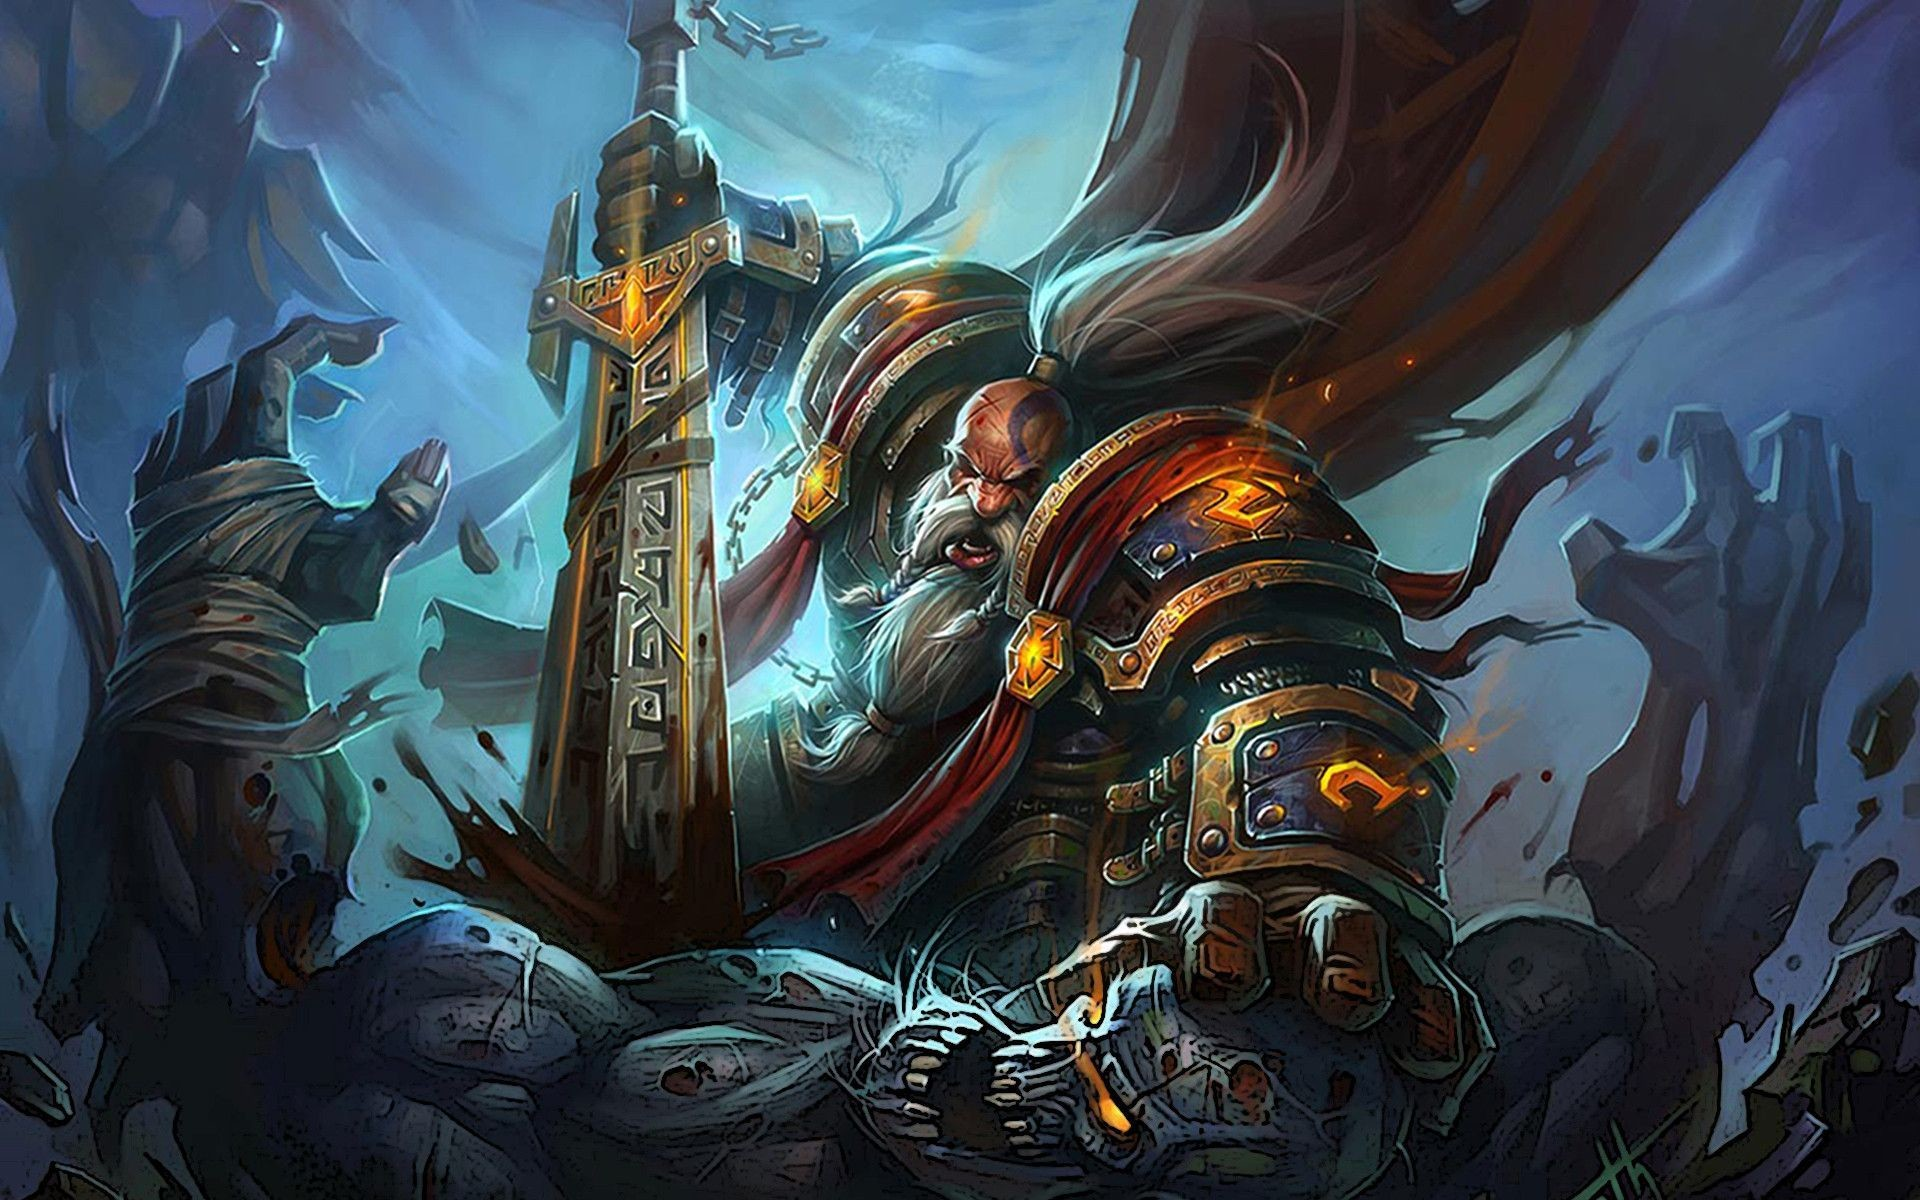 World Of Warcraft Warlords Of Draenor HD Обои Фоны | HD Wallpapers |  Pinterest | Wallpaper and Hd wallpaper